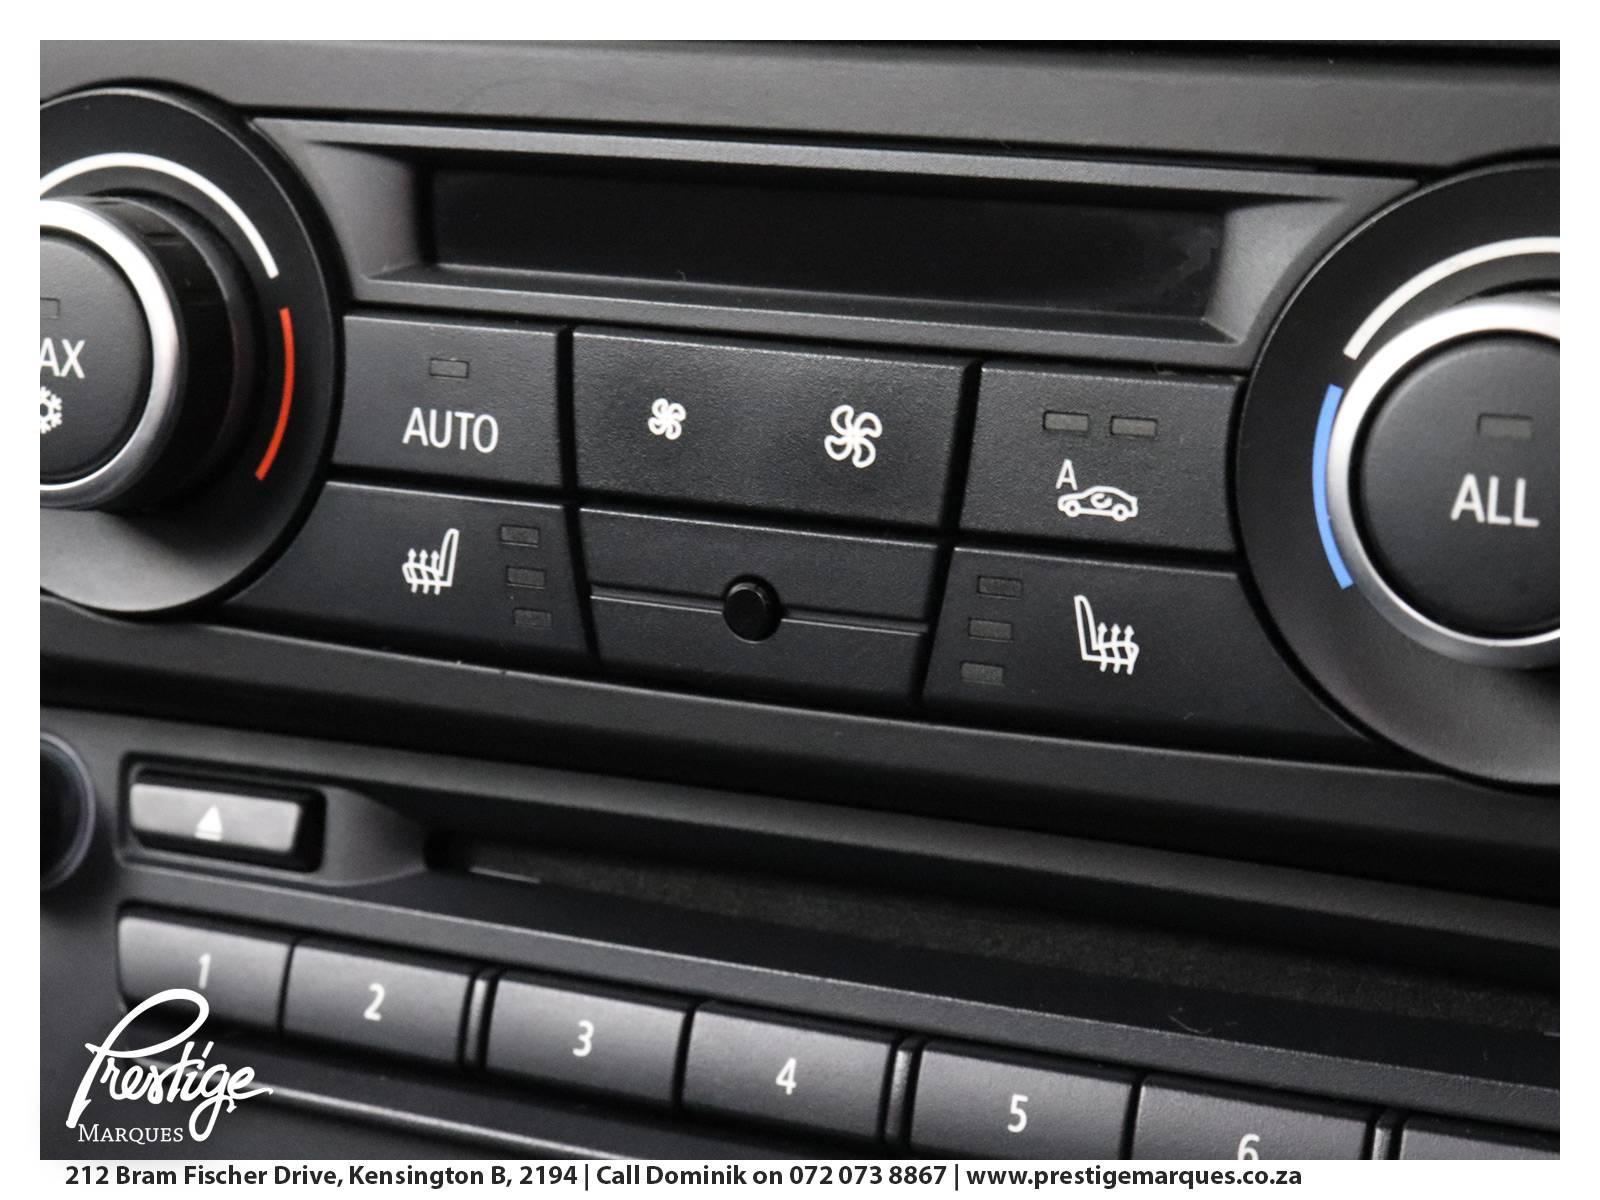 2012-BMW-M3-Prestige-Marques-Randburg-Santon-21